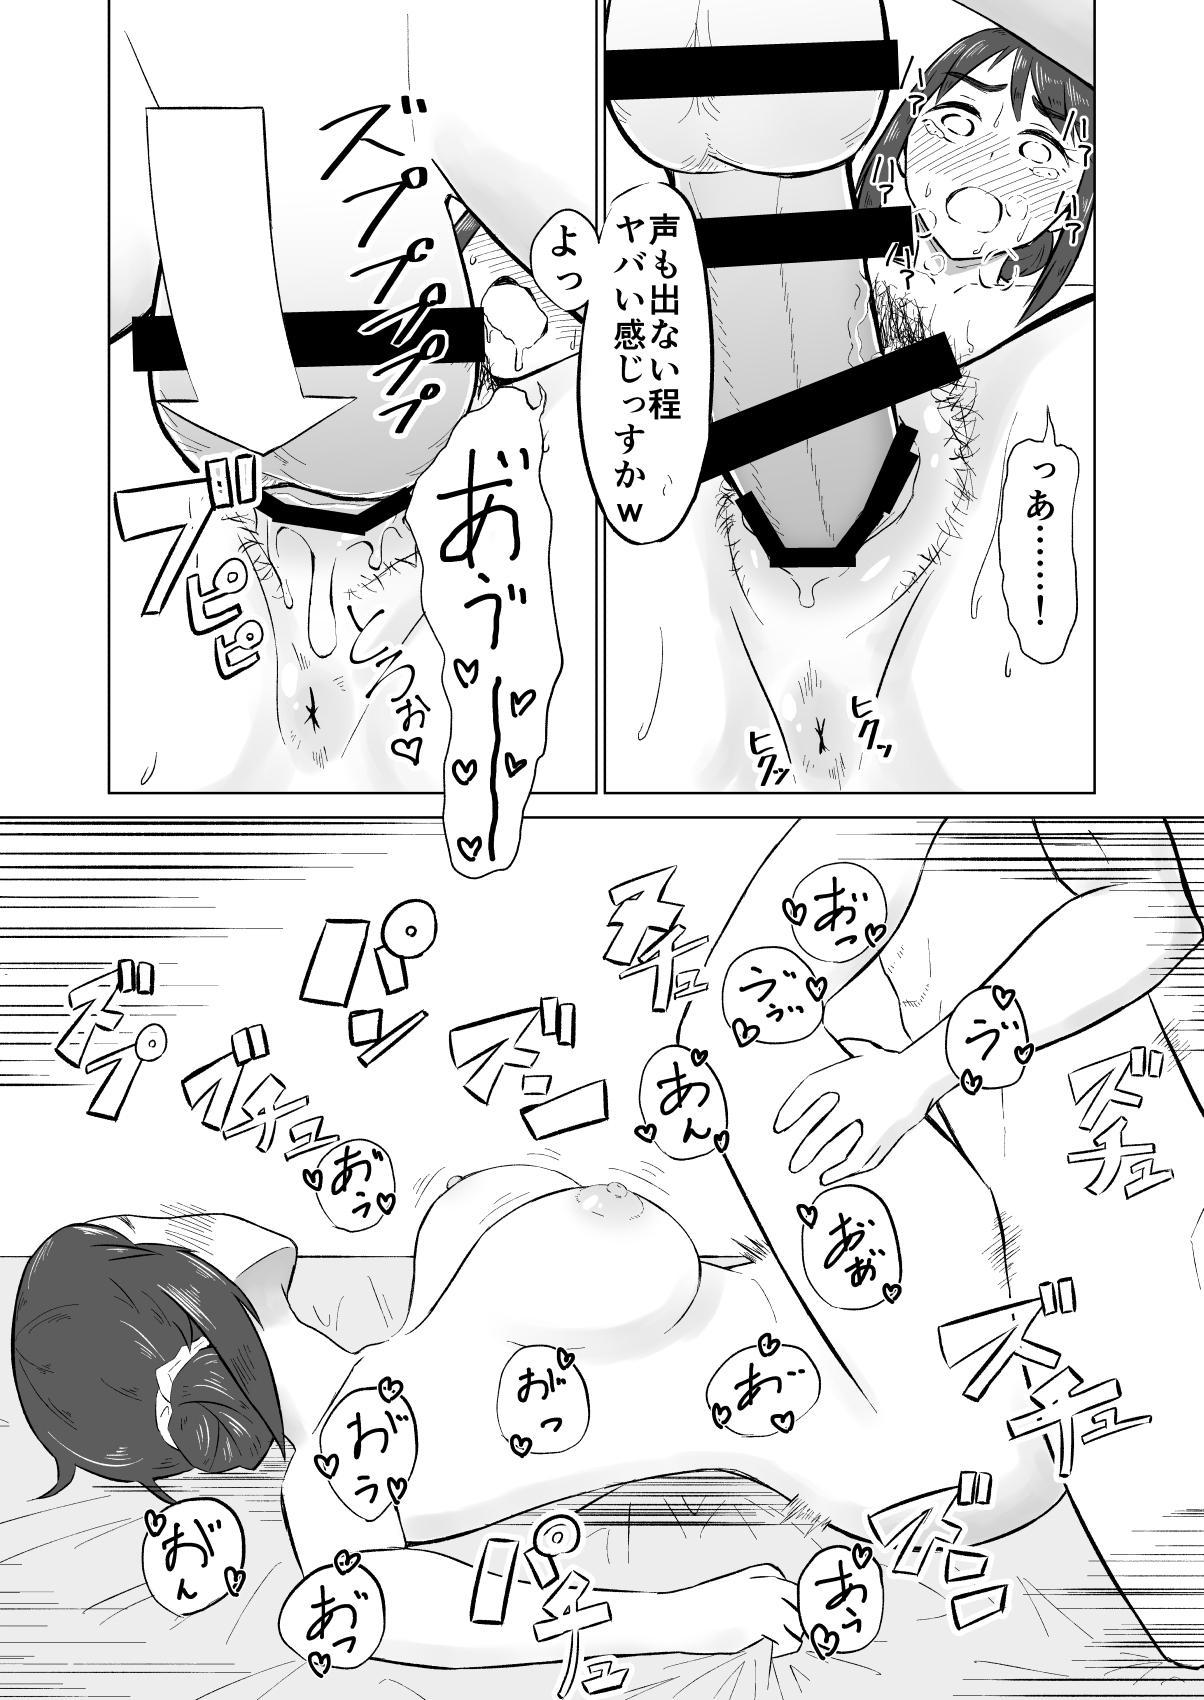 Hitozuma ga Off-kai de Omochikaerare Hon 11